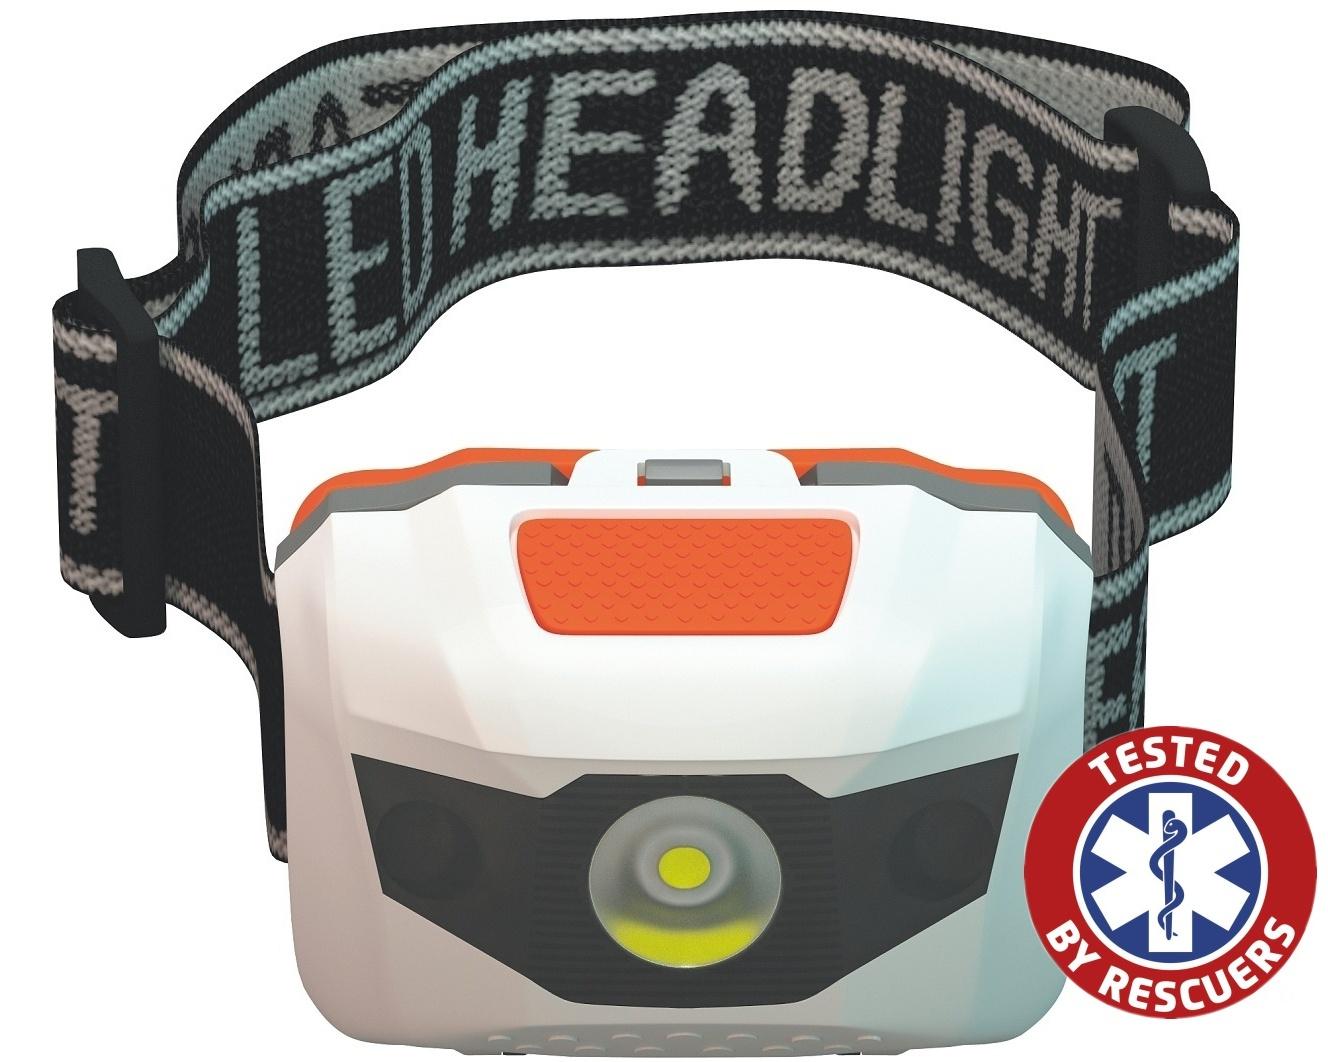 Výkonná LED čelovka 1 Watt, EMOS HL-H0520 | P3521